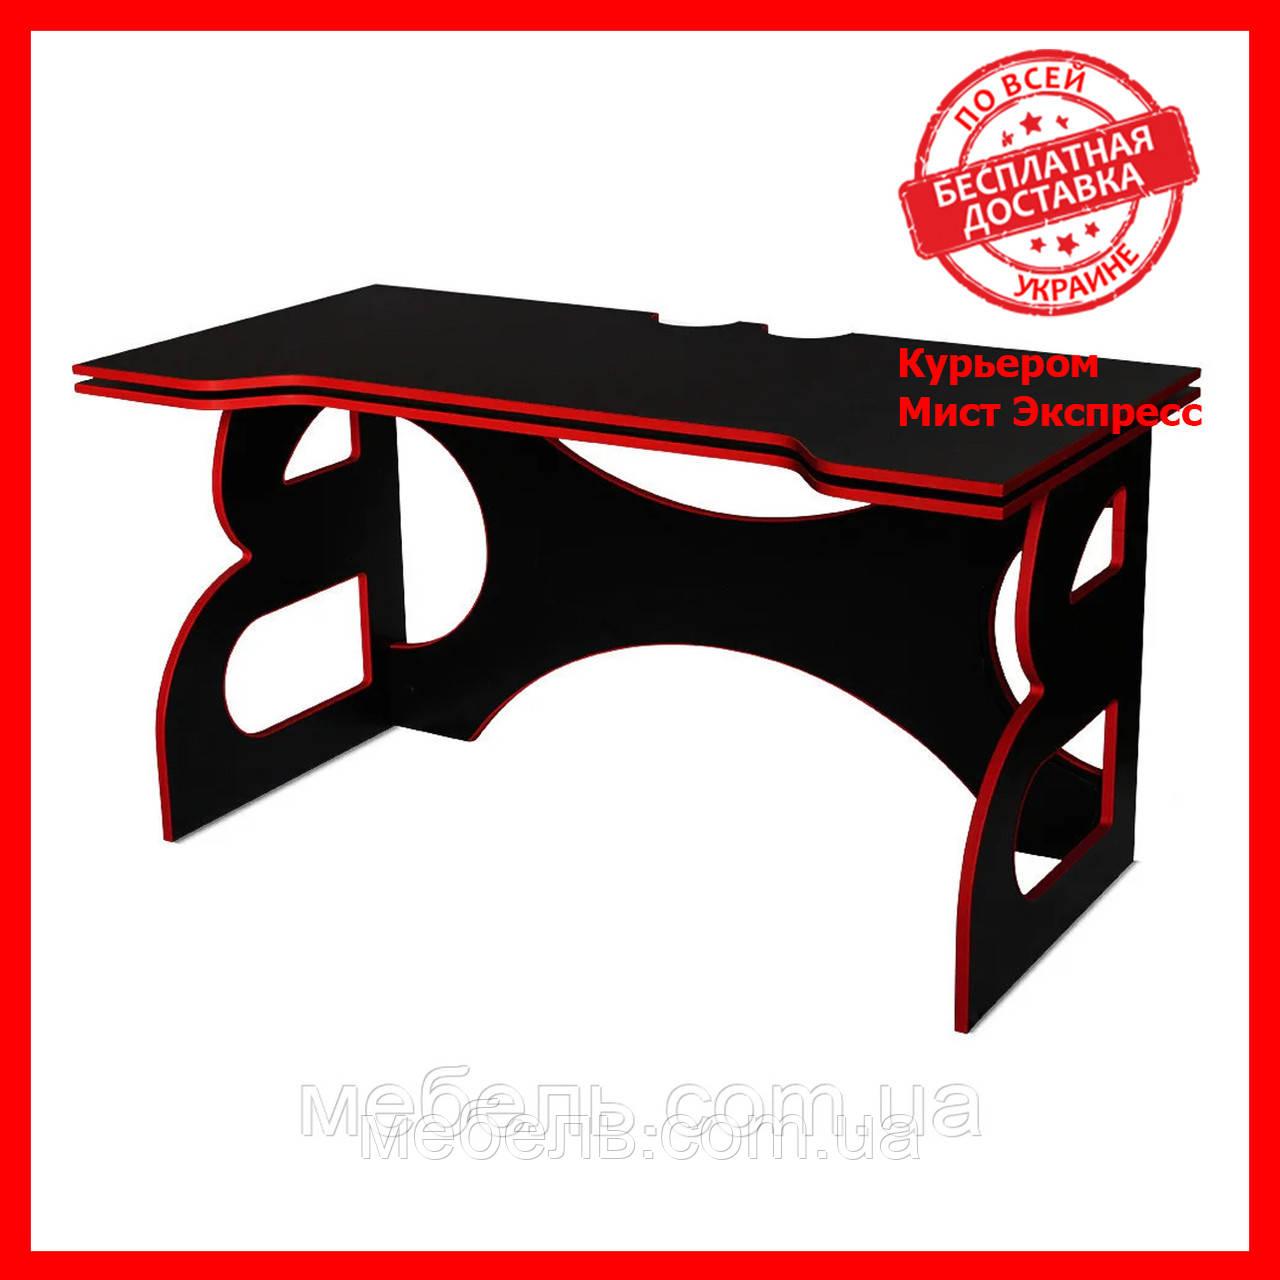 Компьютерный стол Barsky HG-05 Homework Game Red 1400*700, геймерский стол, красный